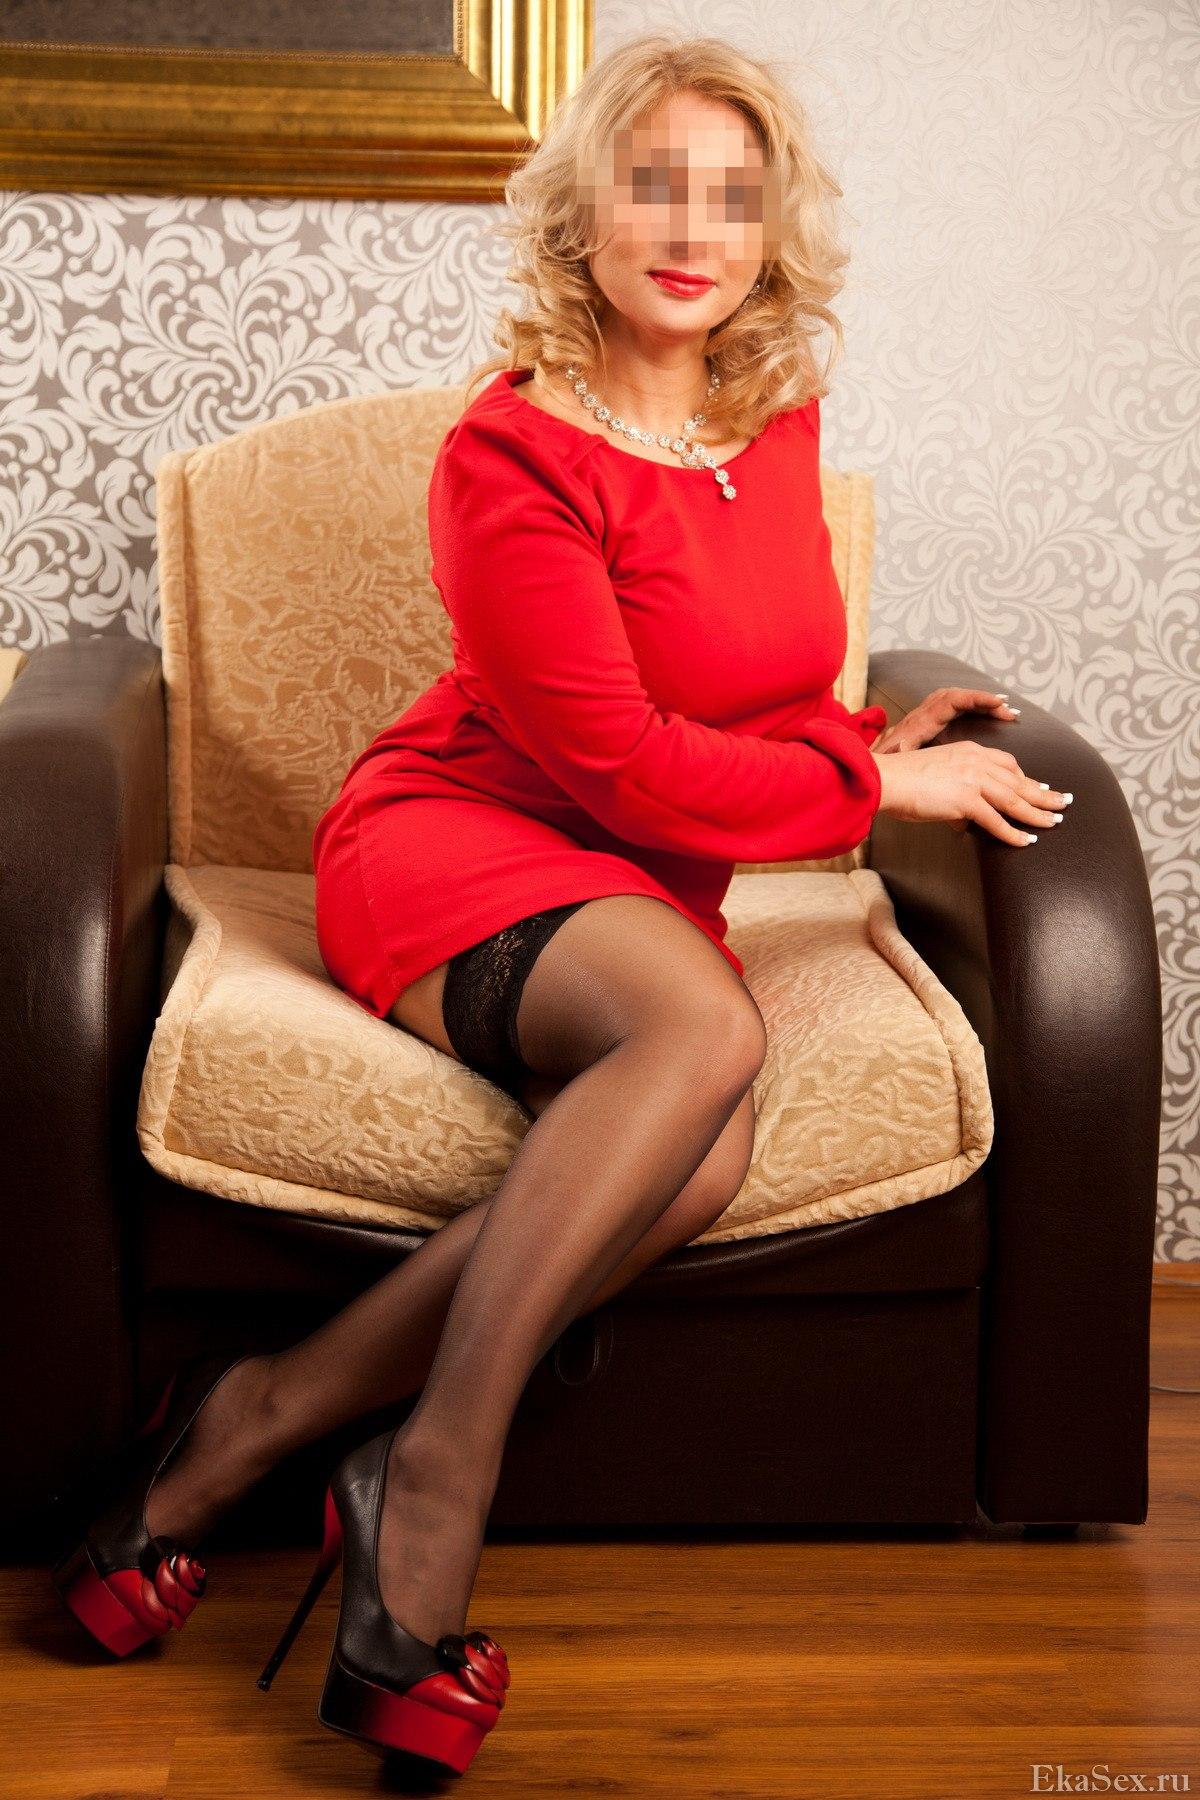 фото проститутки Анечка из города Екатеринбург